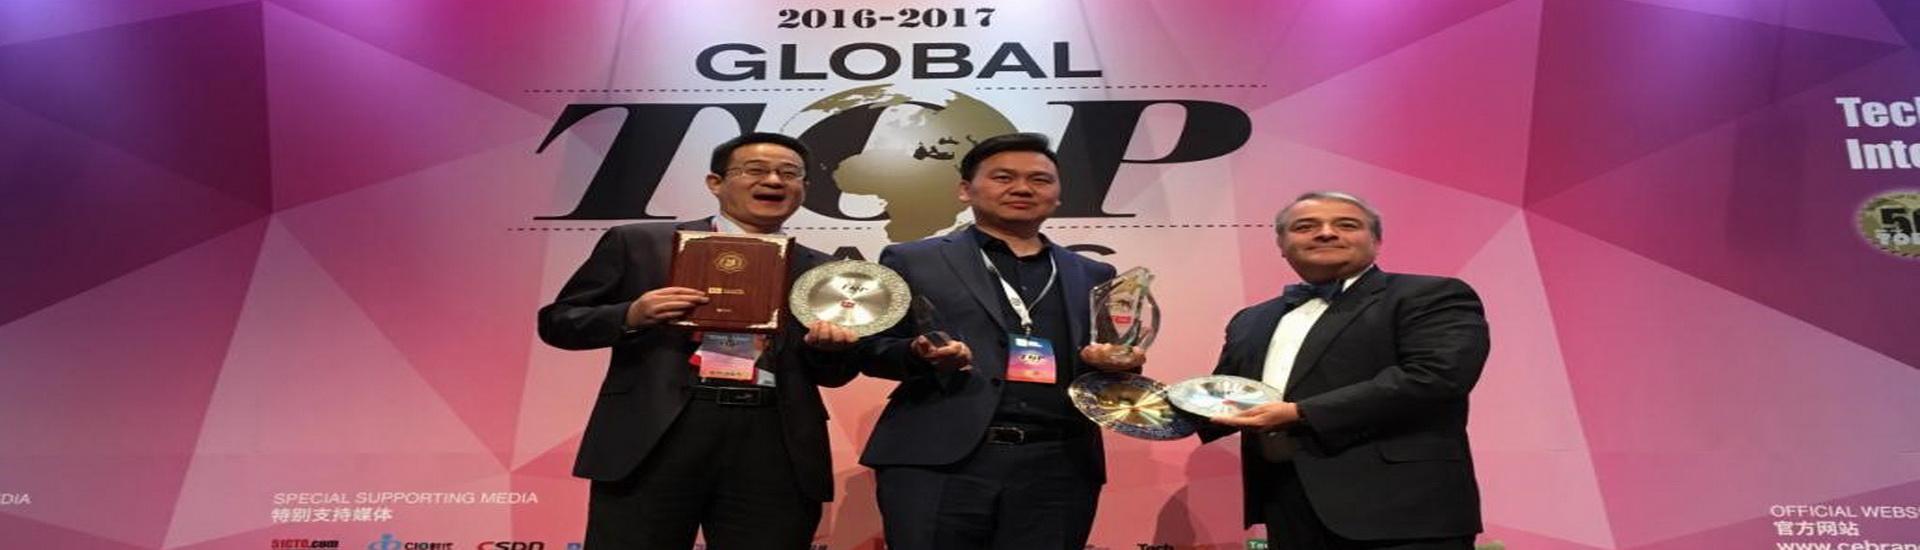 XESS量子点电视荣膺年度全球显示技术创新奖,2017 CES展TCL风采夺目